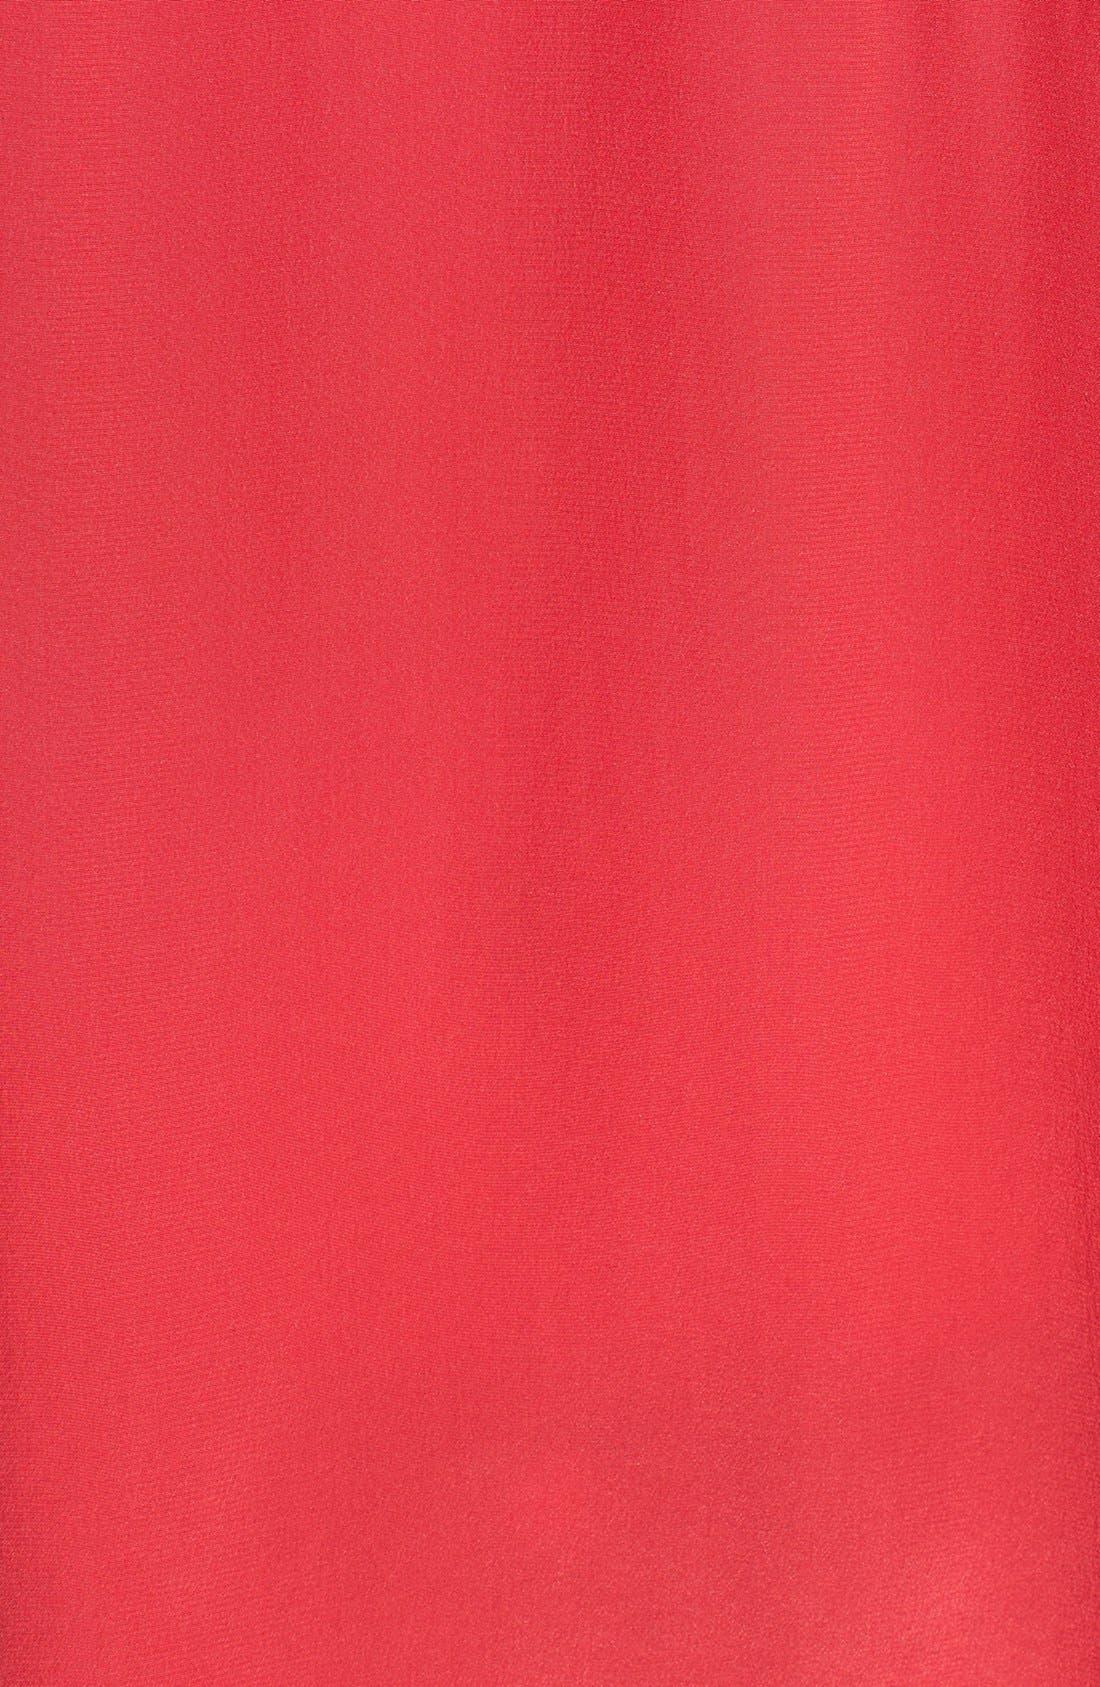 Alternate Image 3  - Joie 'Alicia' Silk Tank